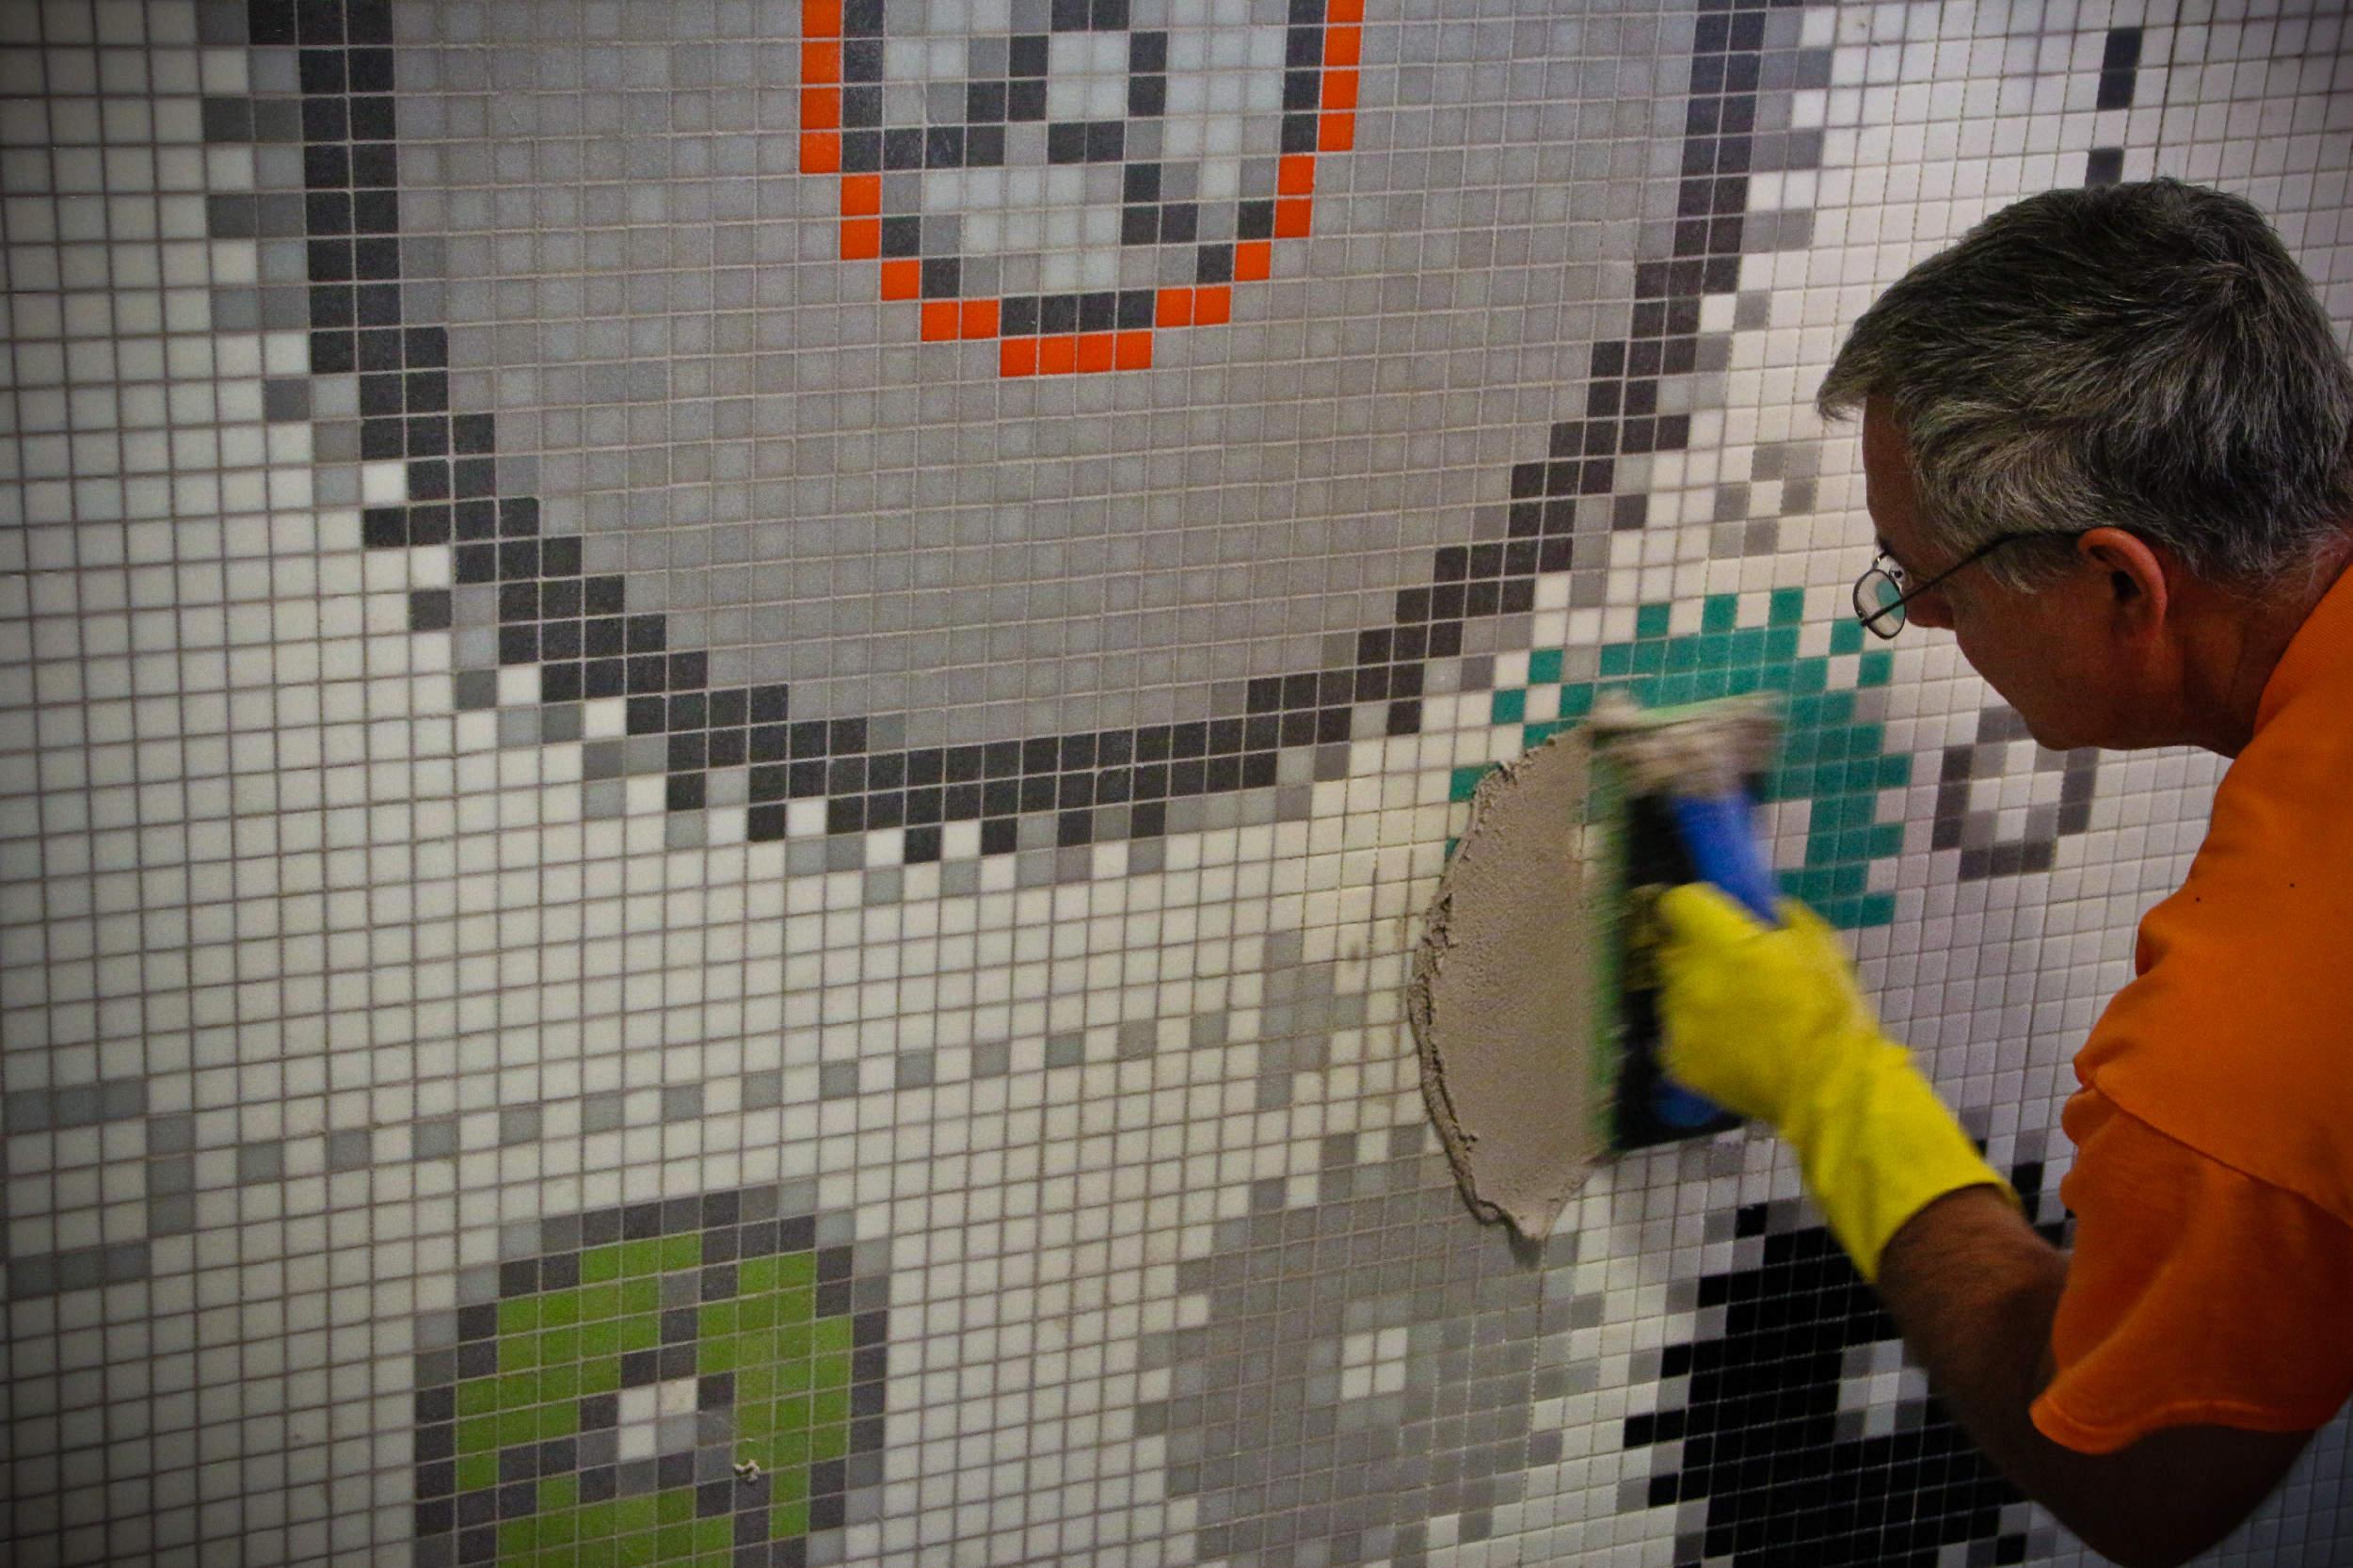 mosaic tile installation information